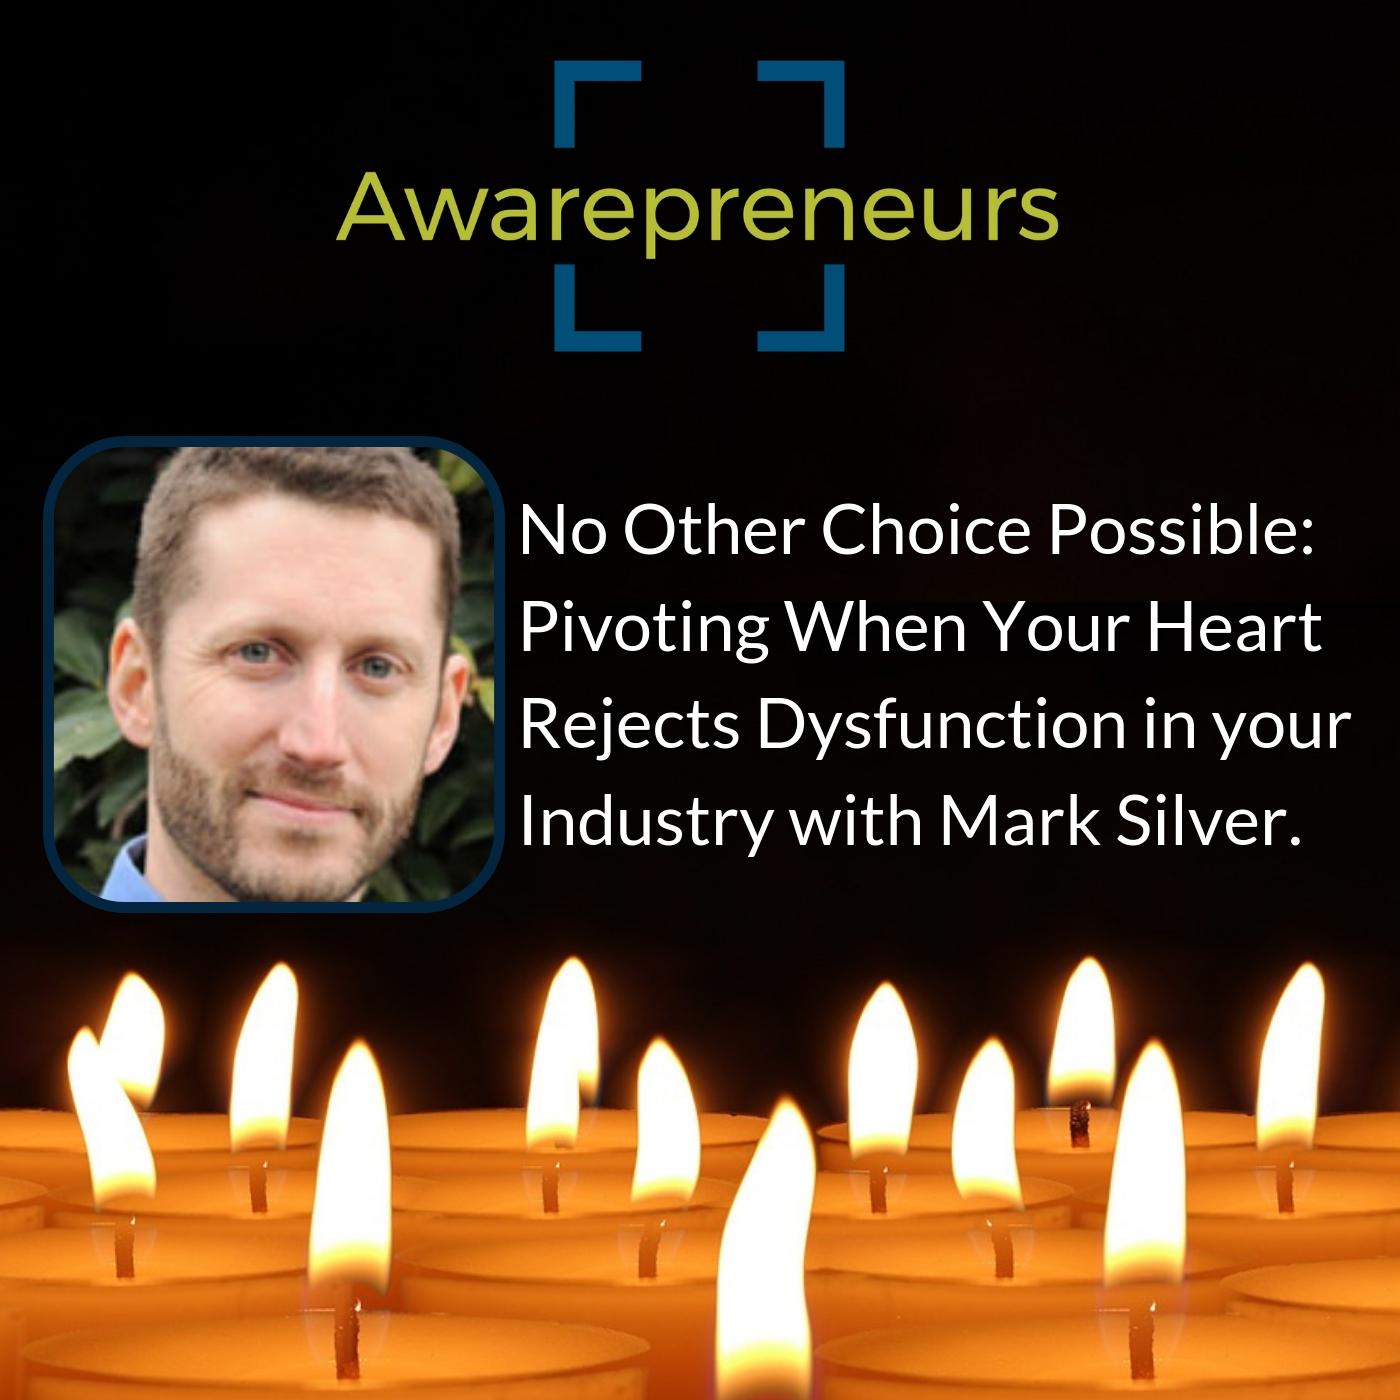 Mark Silver pivoting.jpg